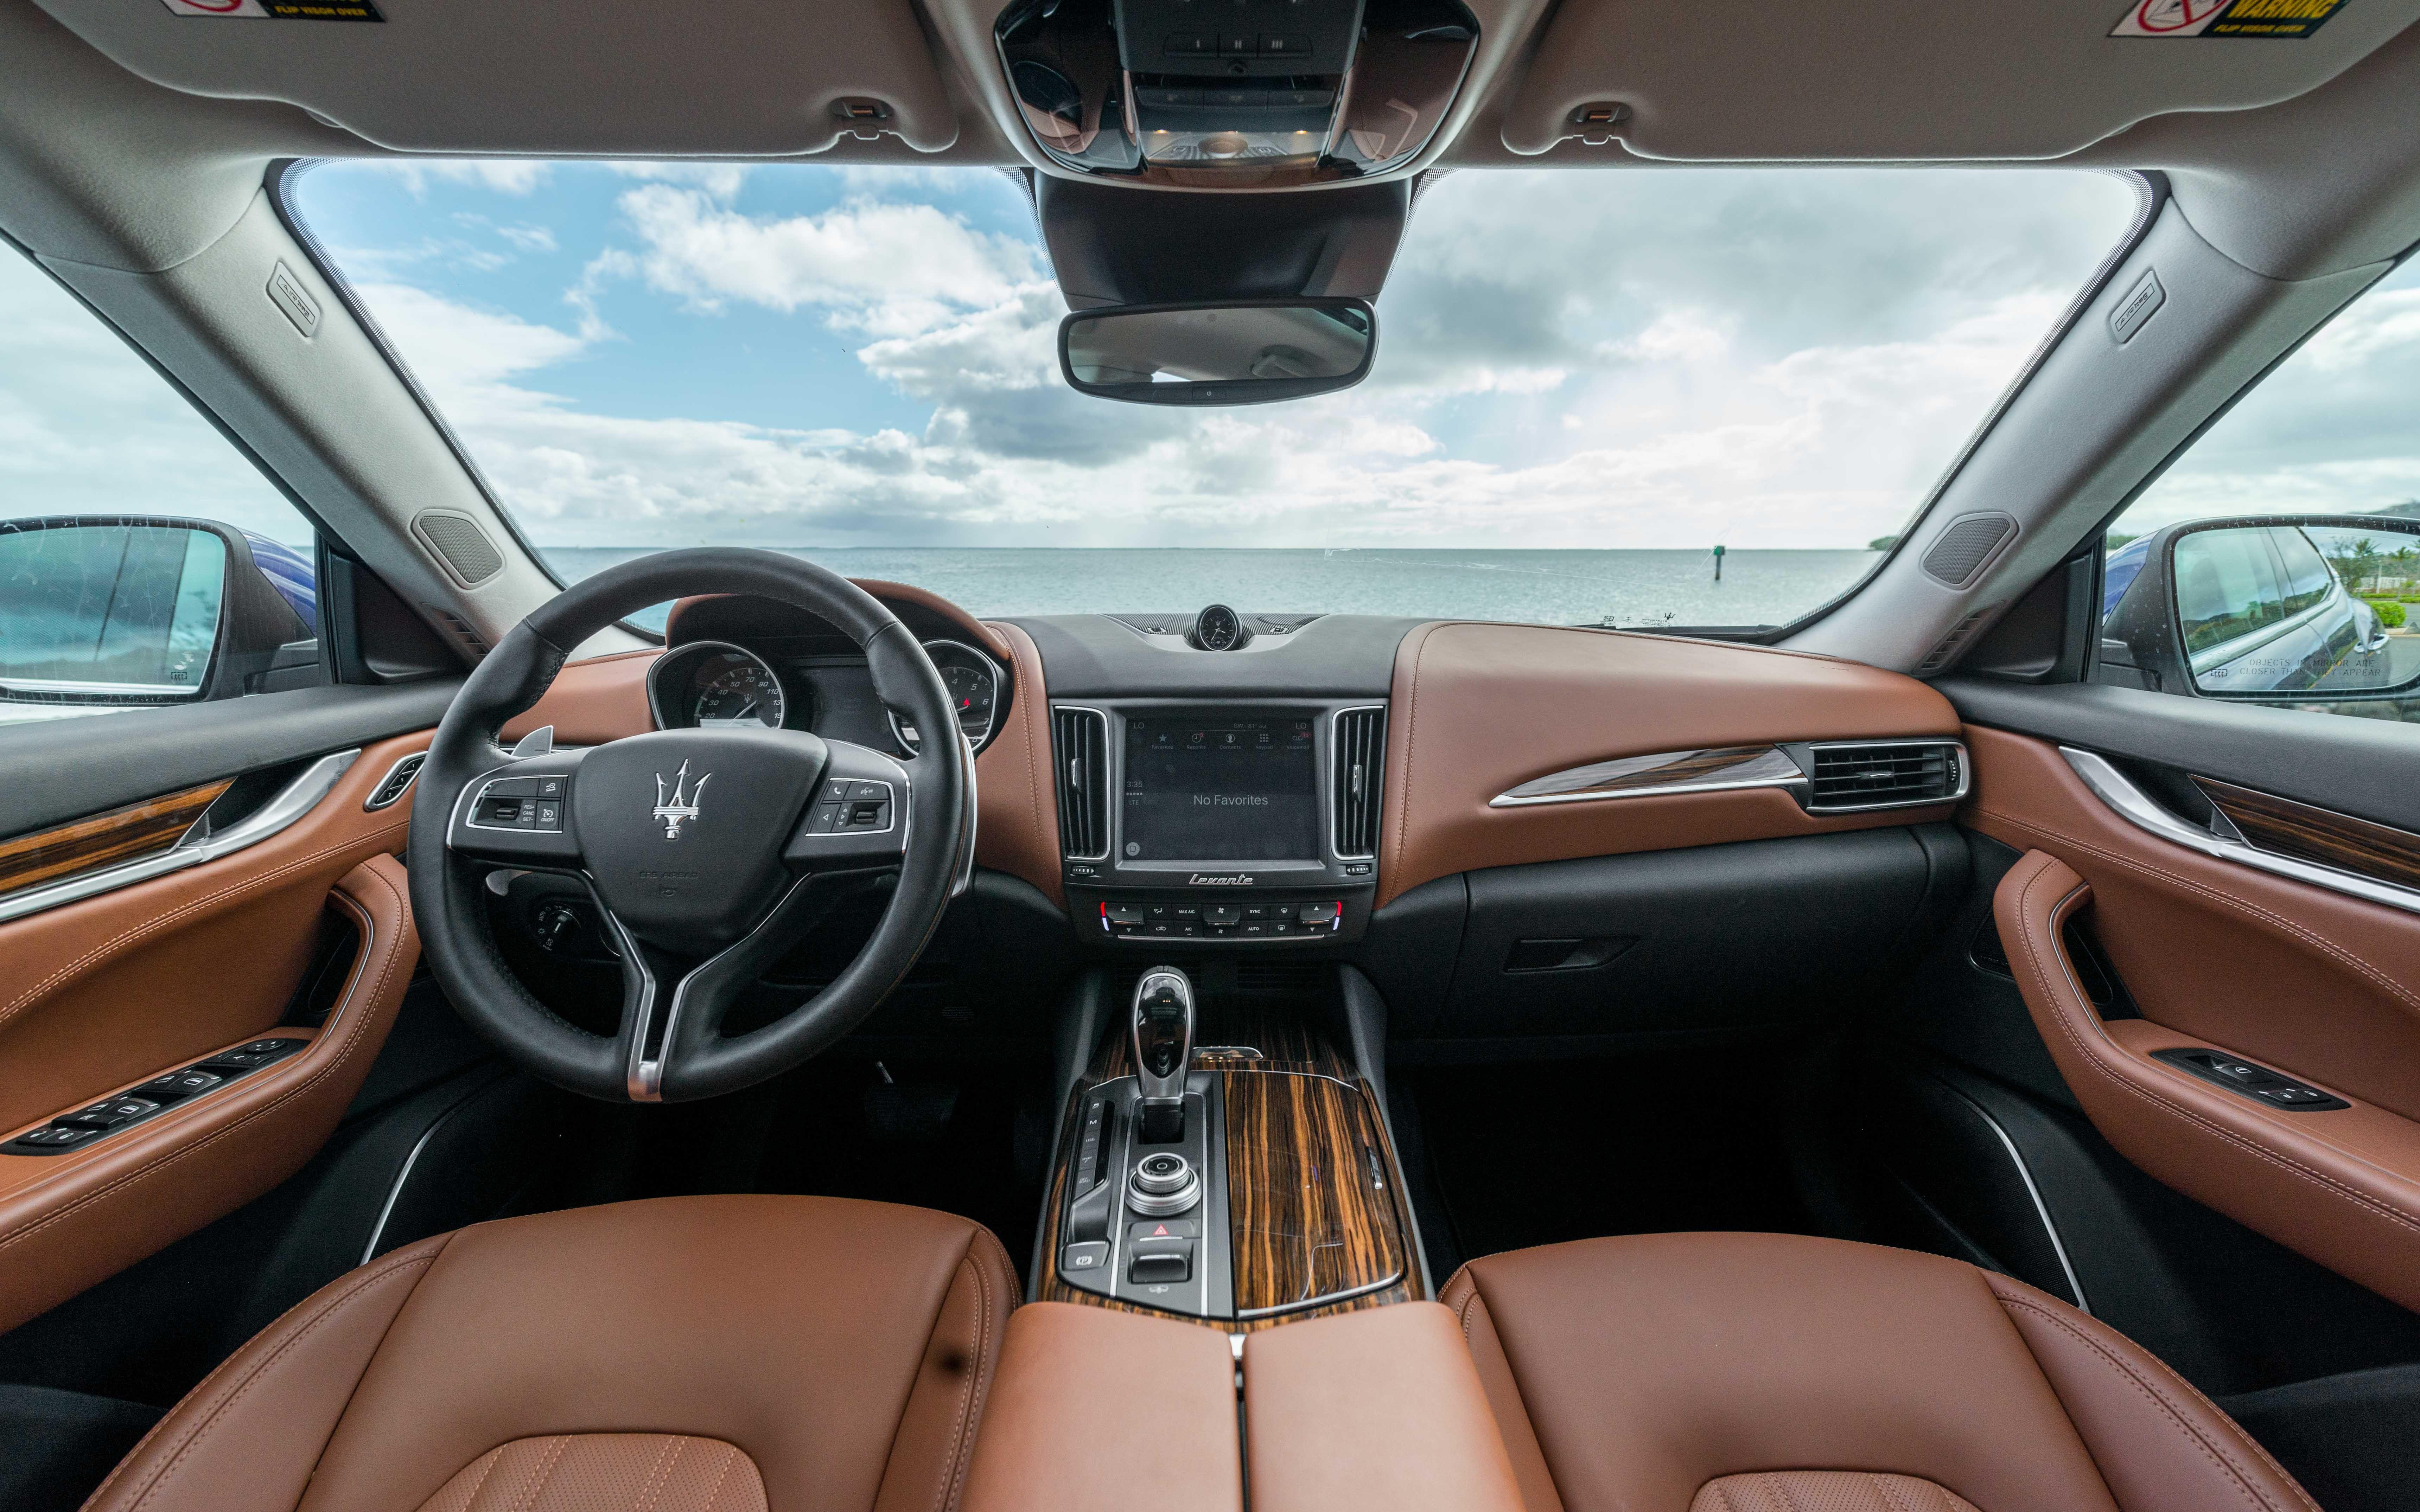 2017 Maserati Levante Interior Maserati Maserati Dealership